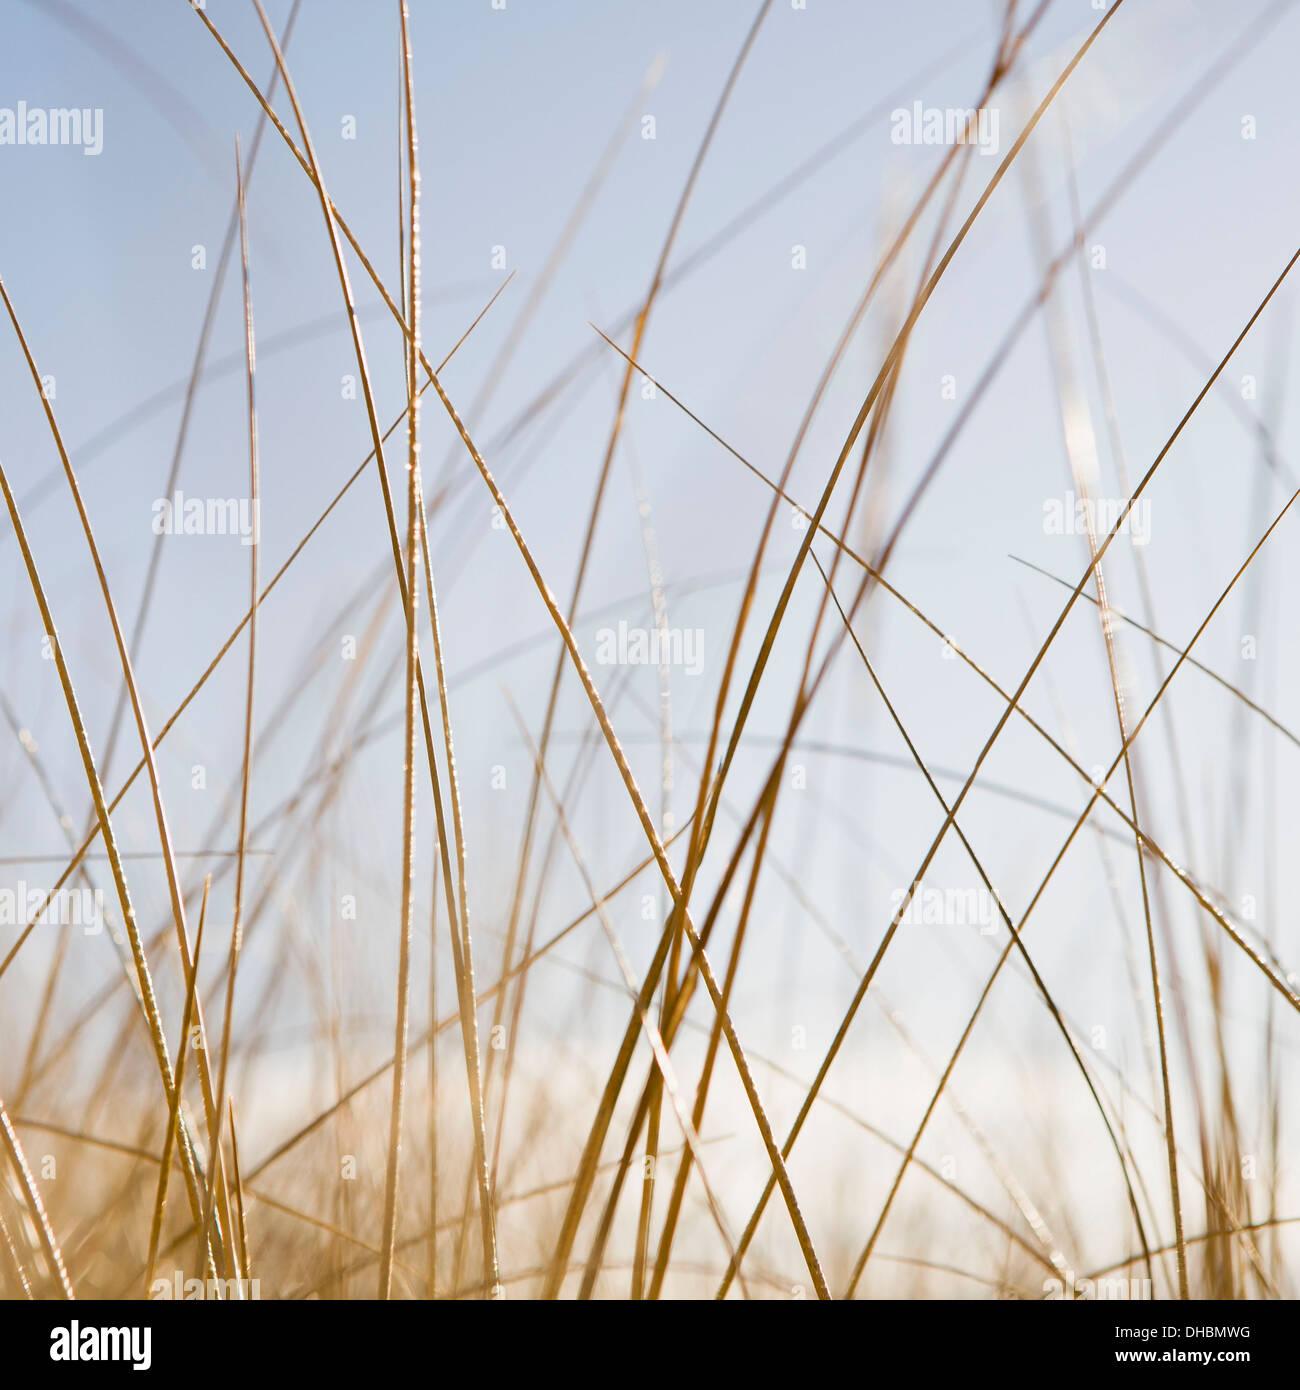 Sea grasses on Long Beach Peninsula, on the coast of Washington state. - Stock Image